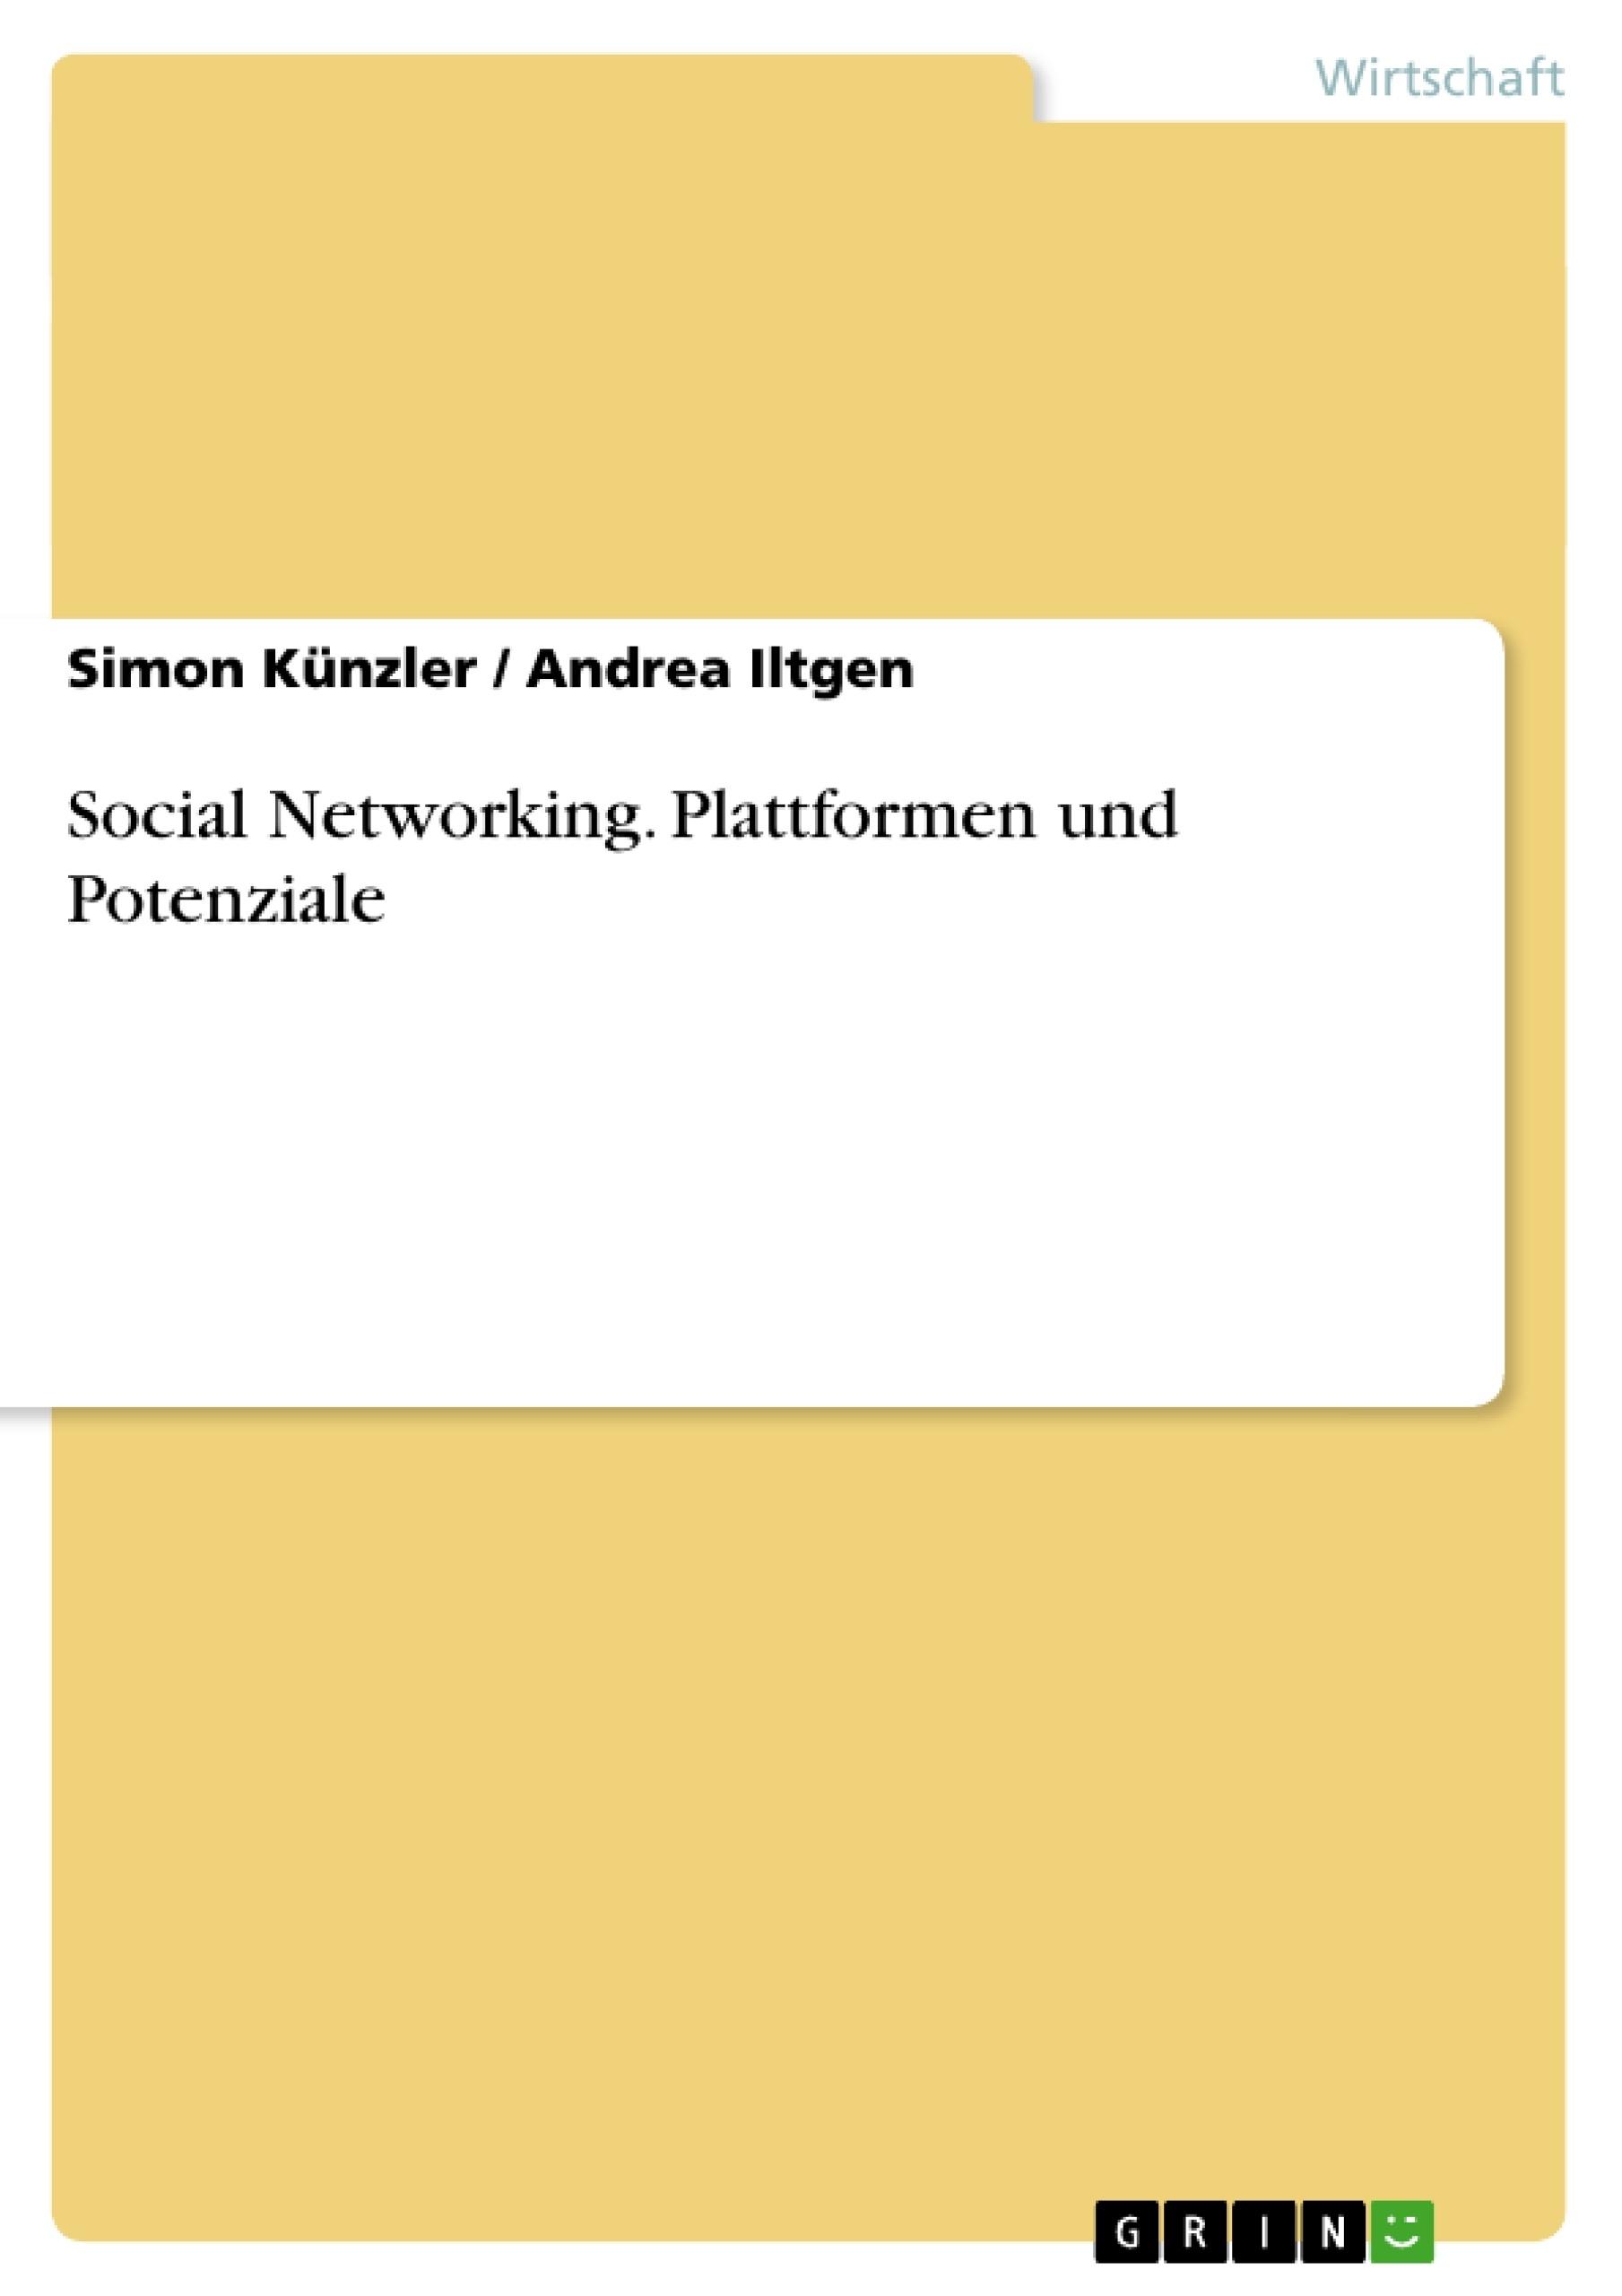 Titel: Social Networking. Plattformen und Potenziale